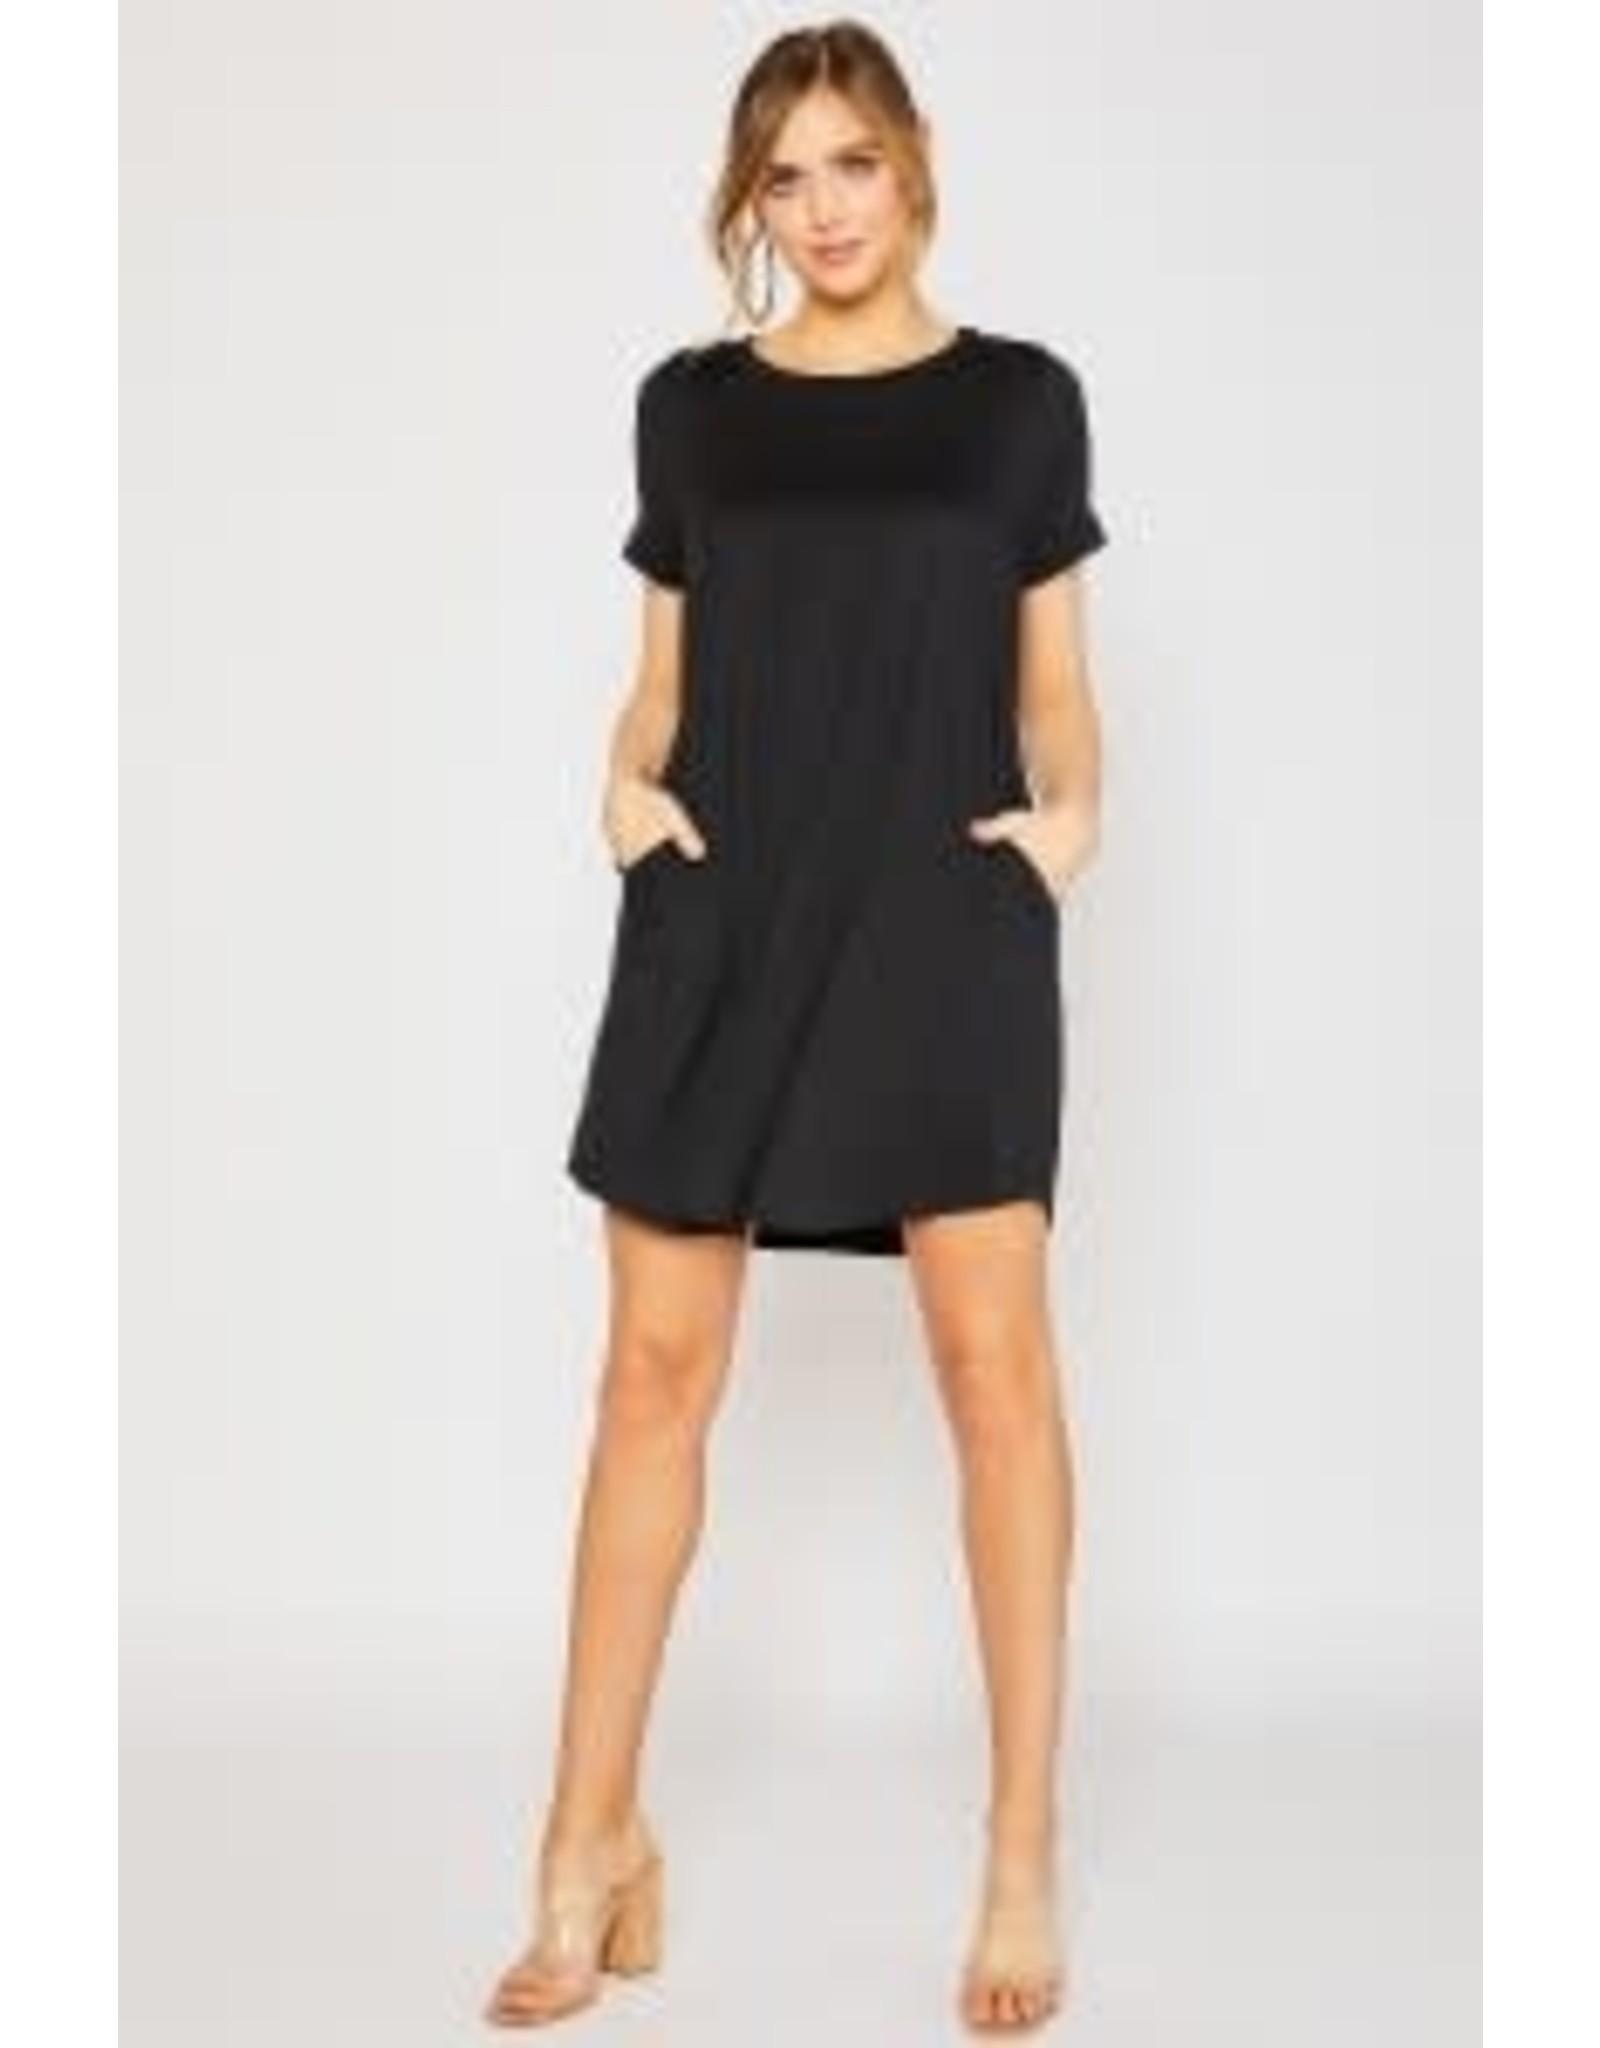 Mittoshop Black Knit Dress with Pockets